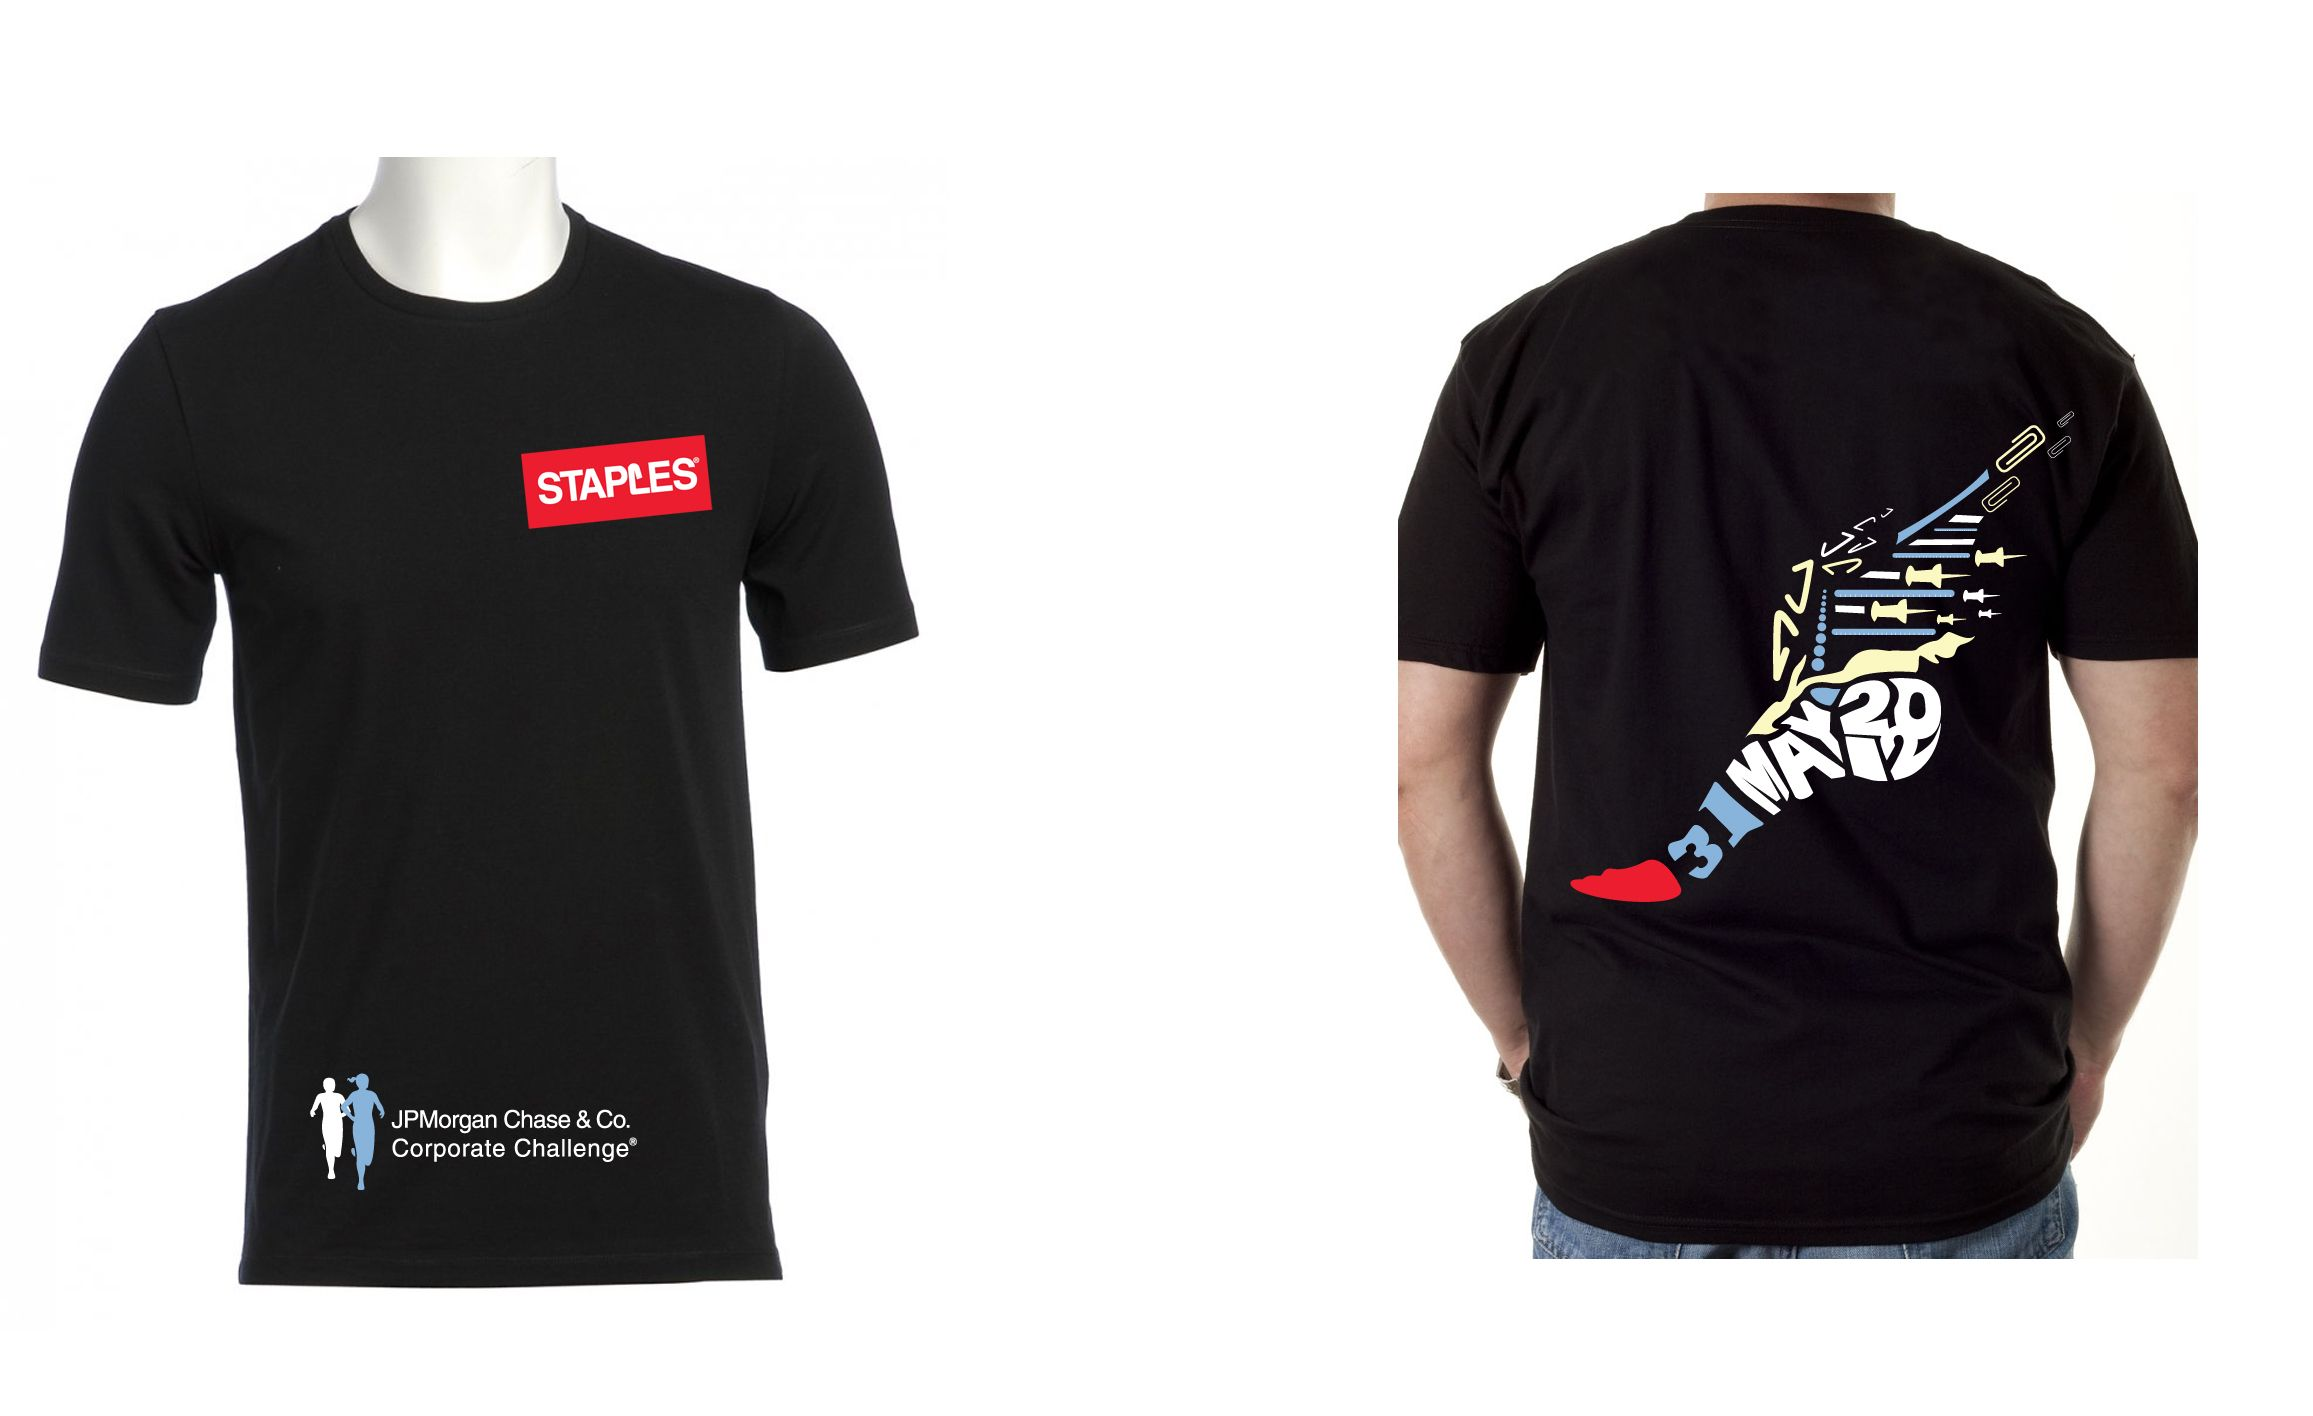 t shirt design ideas home design ideas company download